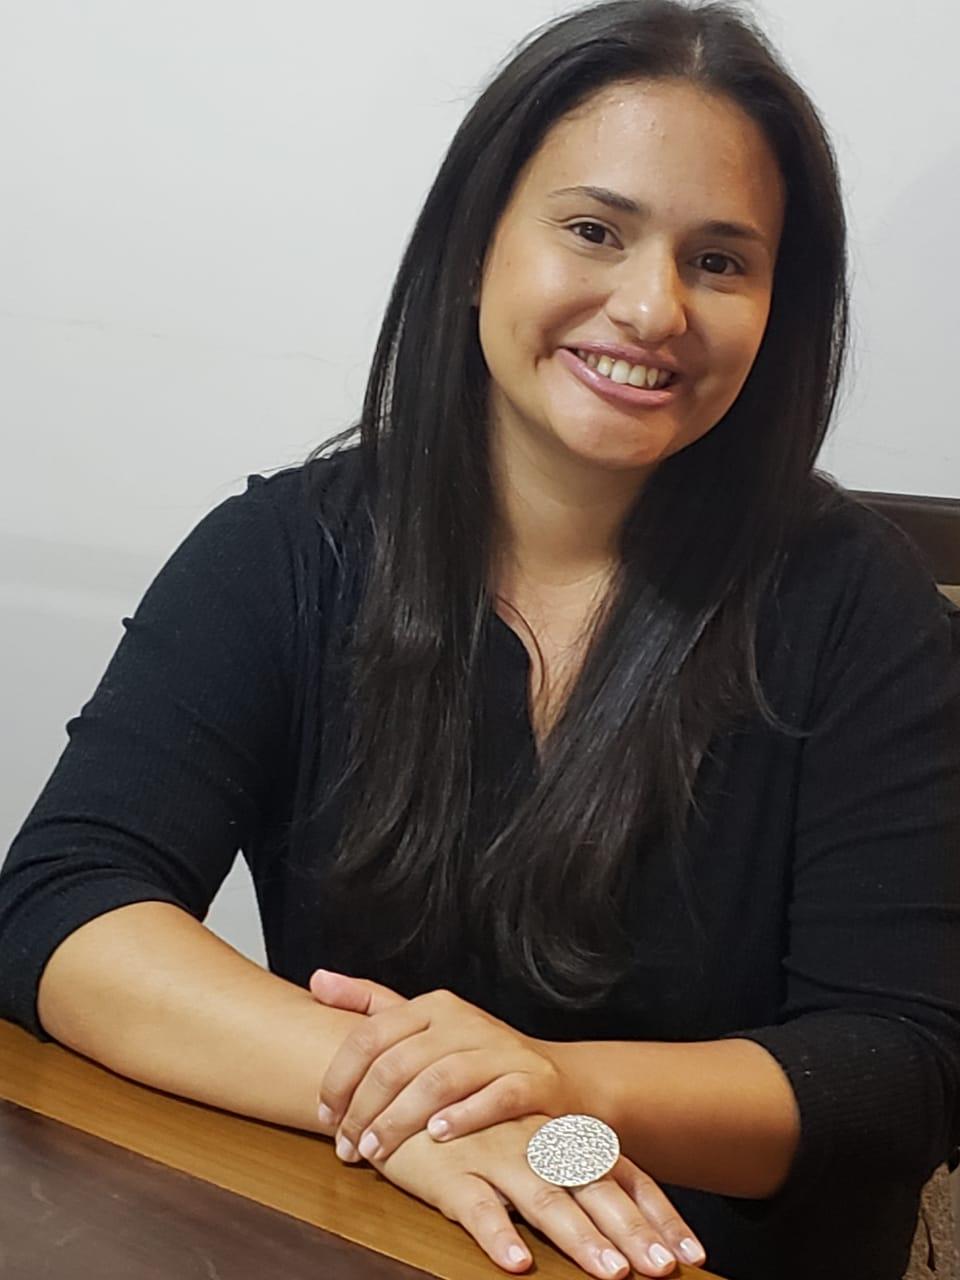 Advogada Gabriela Totti Foto: Acervo pessoal